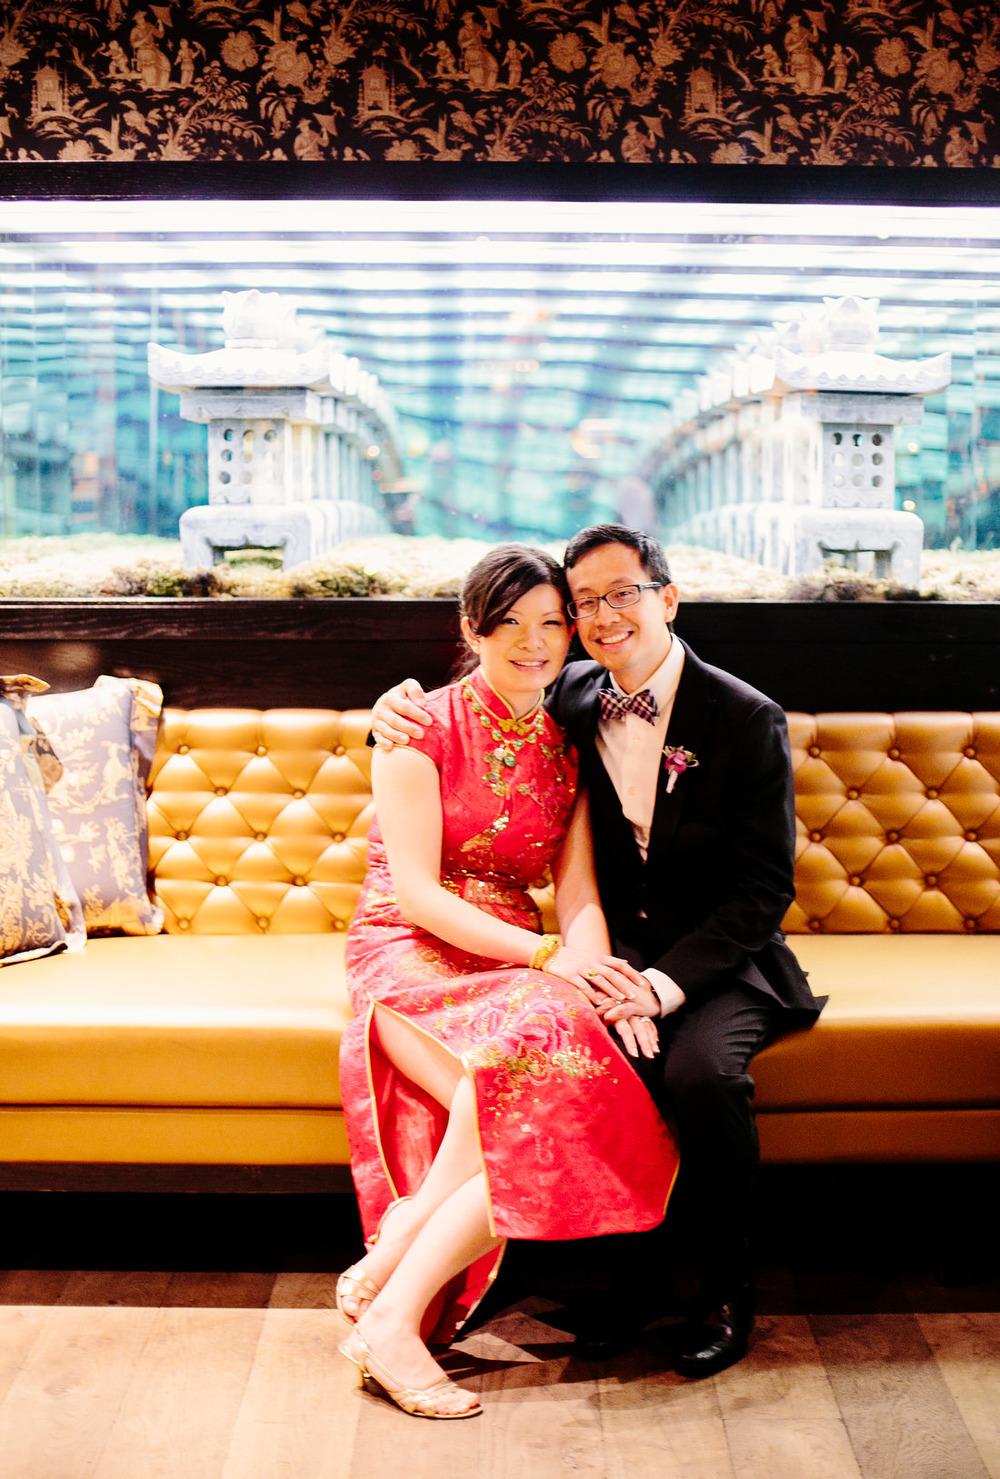 Museumofscience_wedding_085.JPG